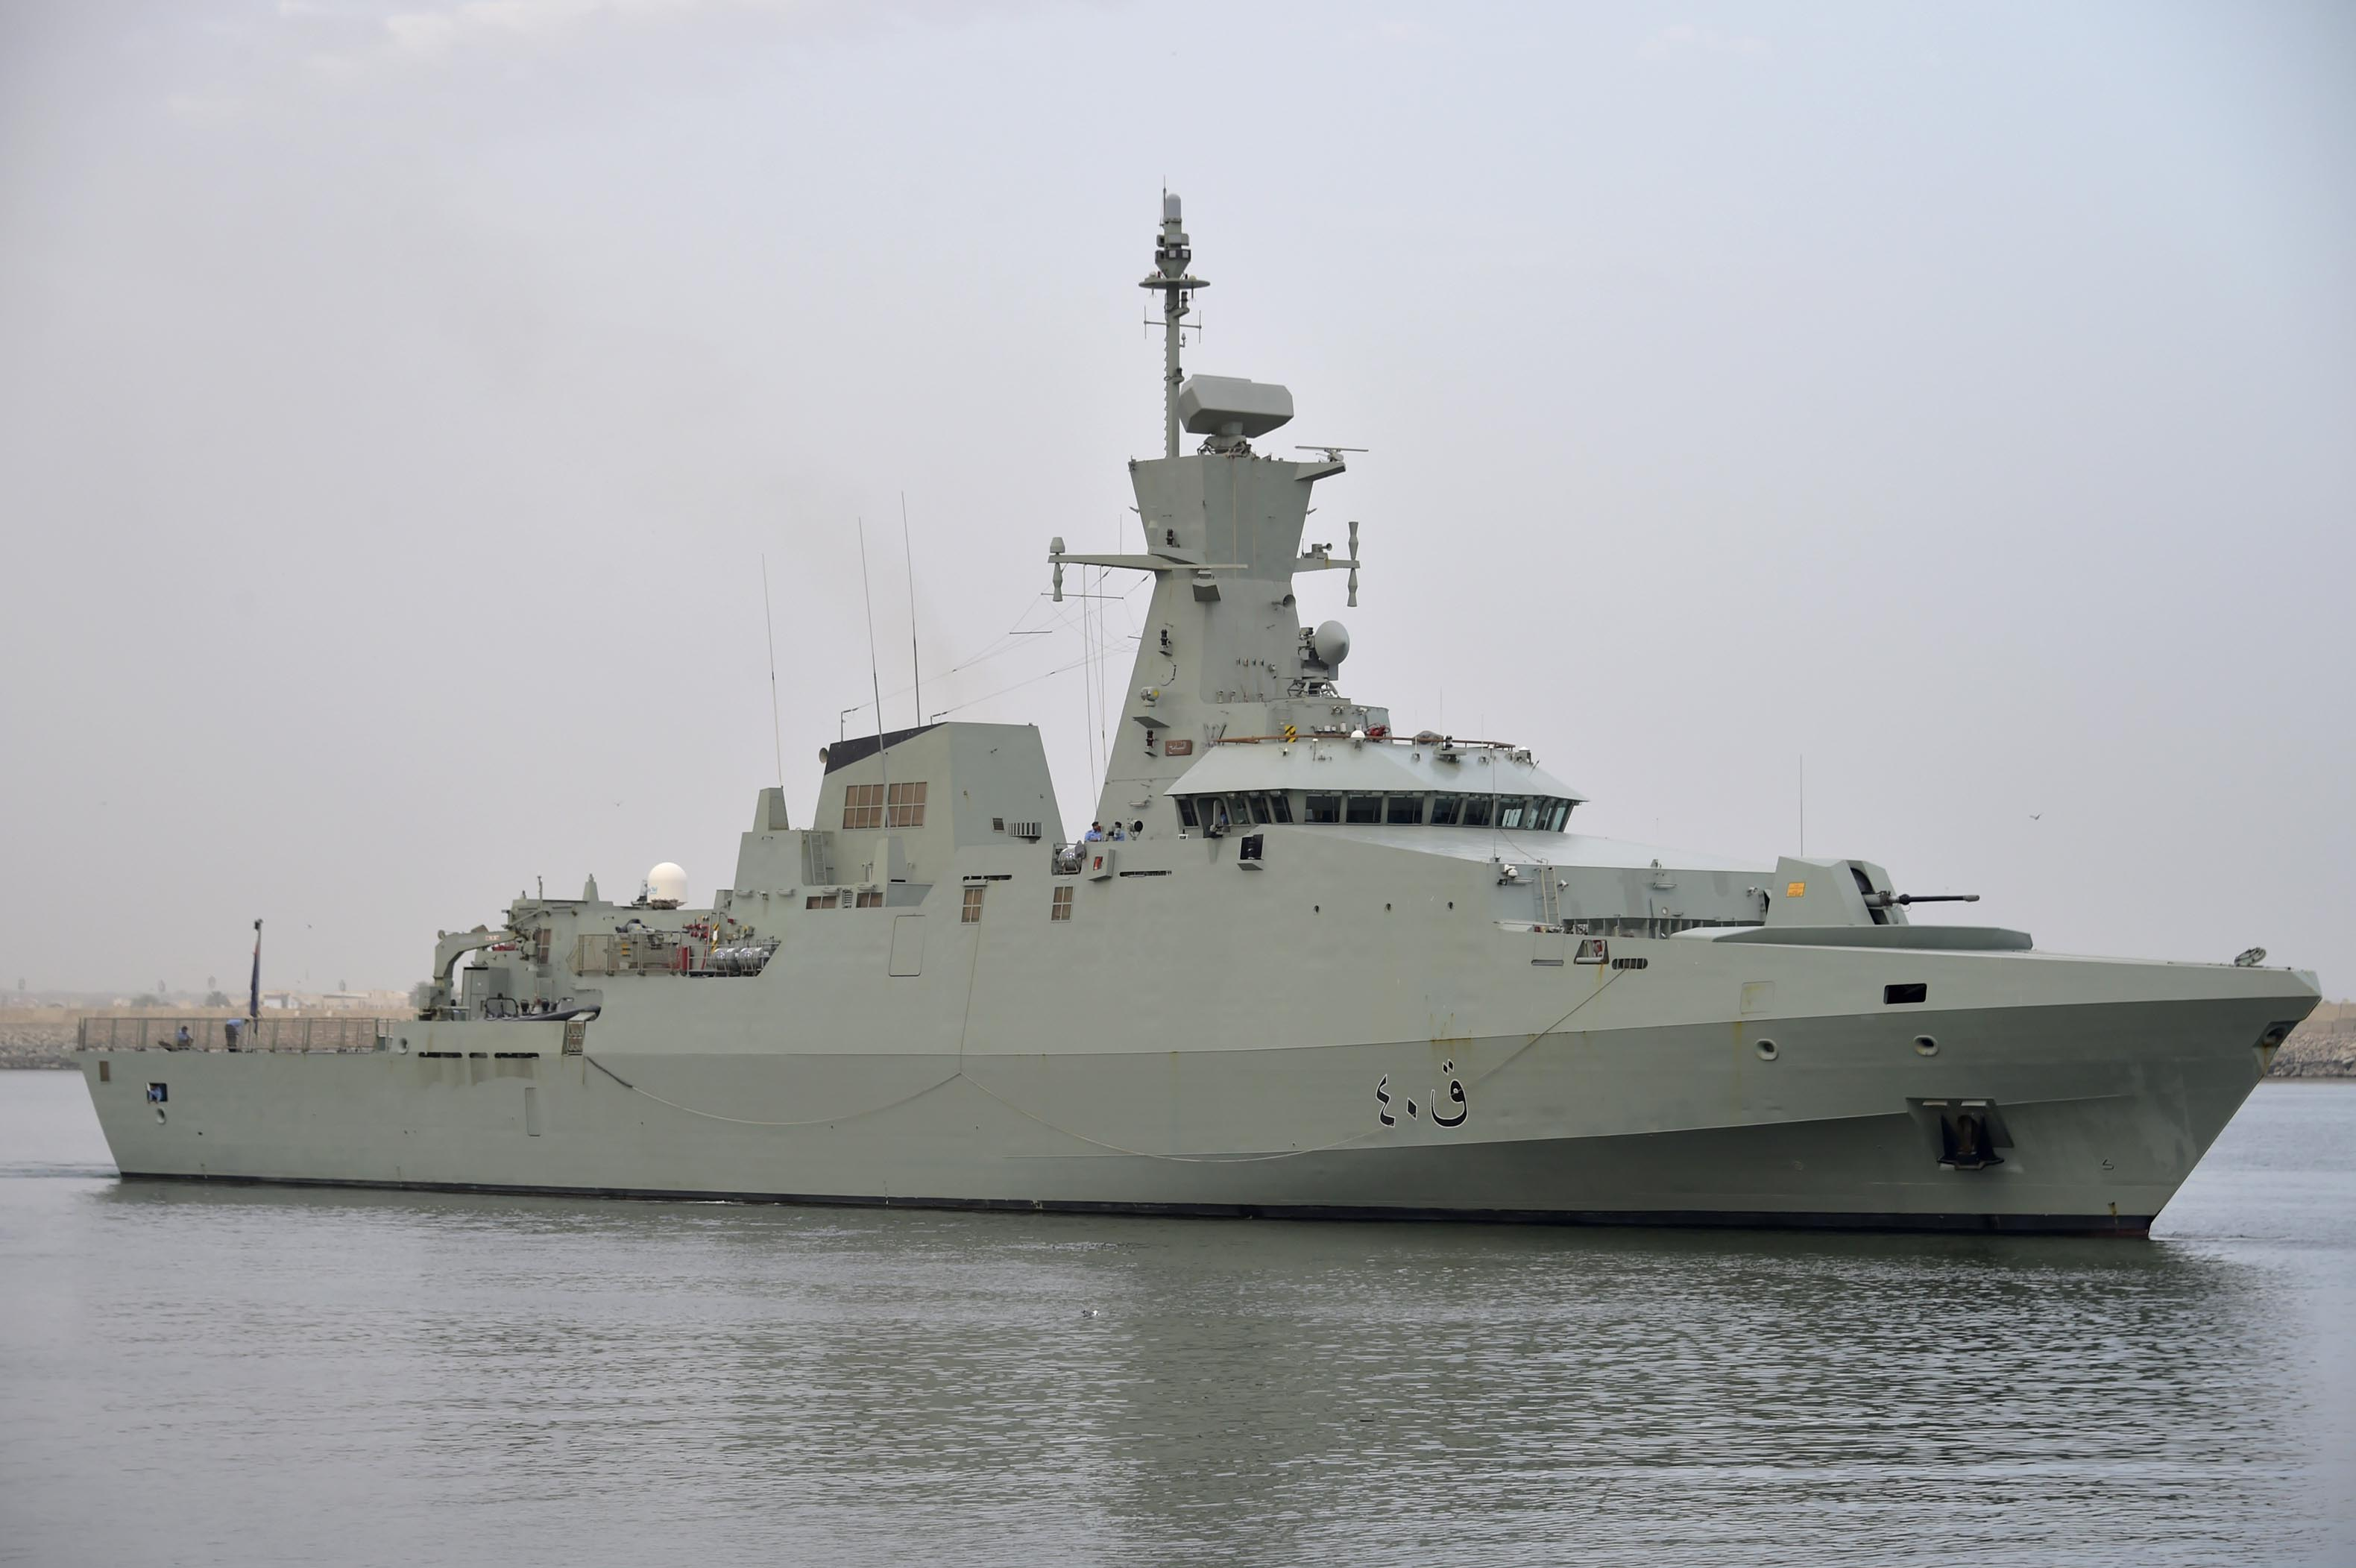 Royal Navy of Oman starts Sharp Dagger naval drill